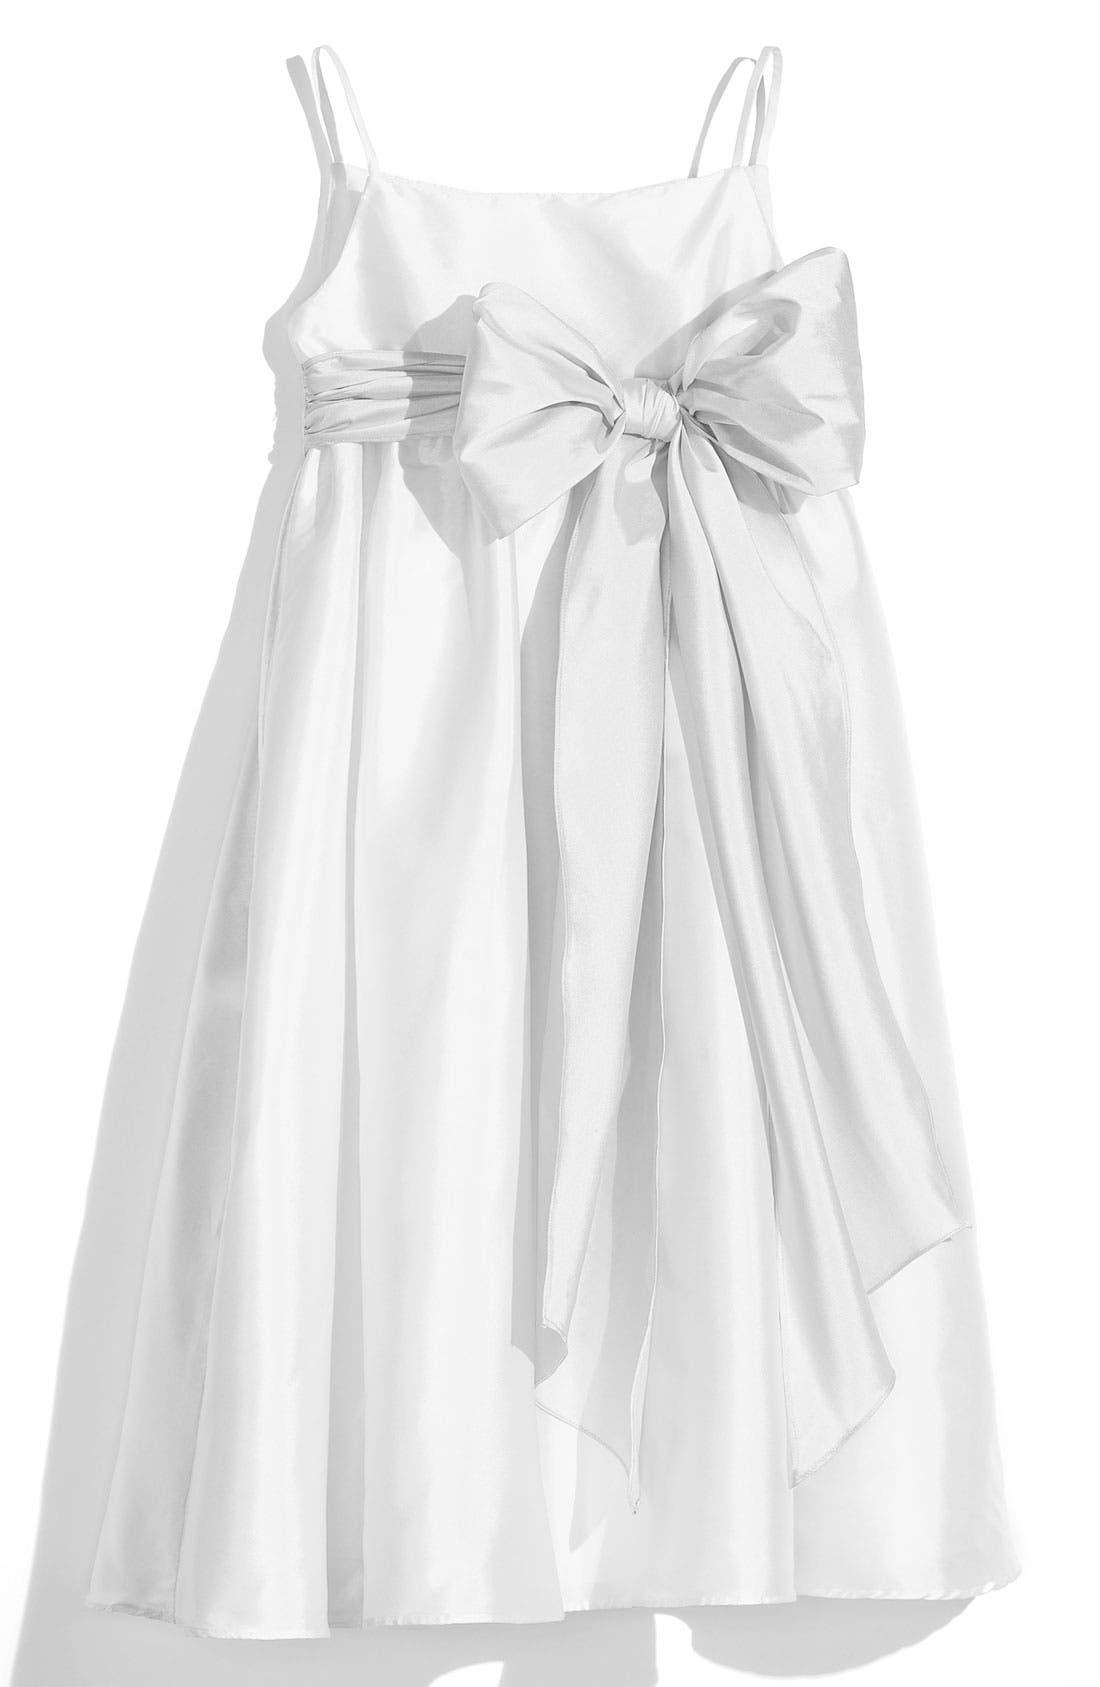 White Sleeveless Empire Waist Taffeta Dress,                         Main,                         color, White/ White